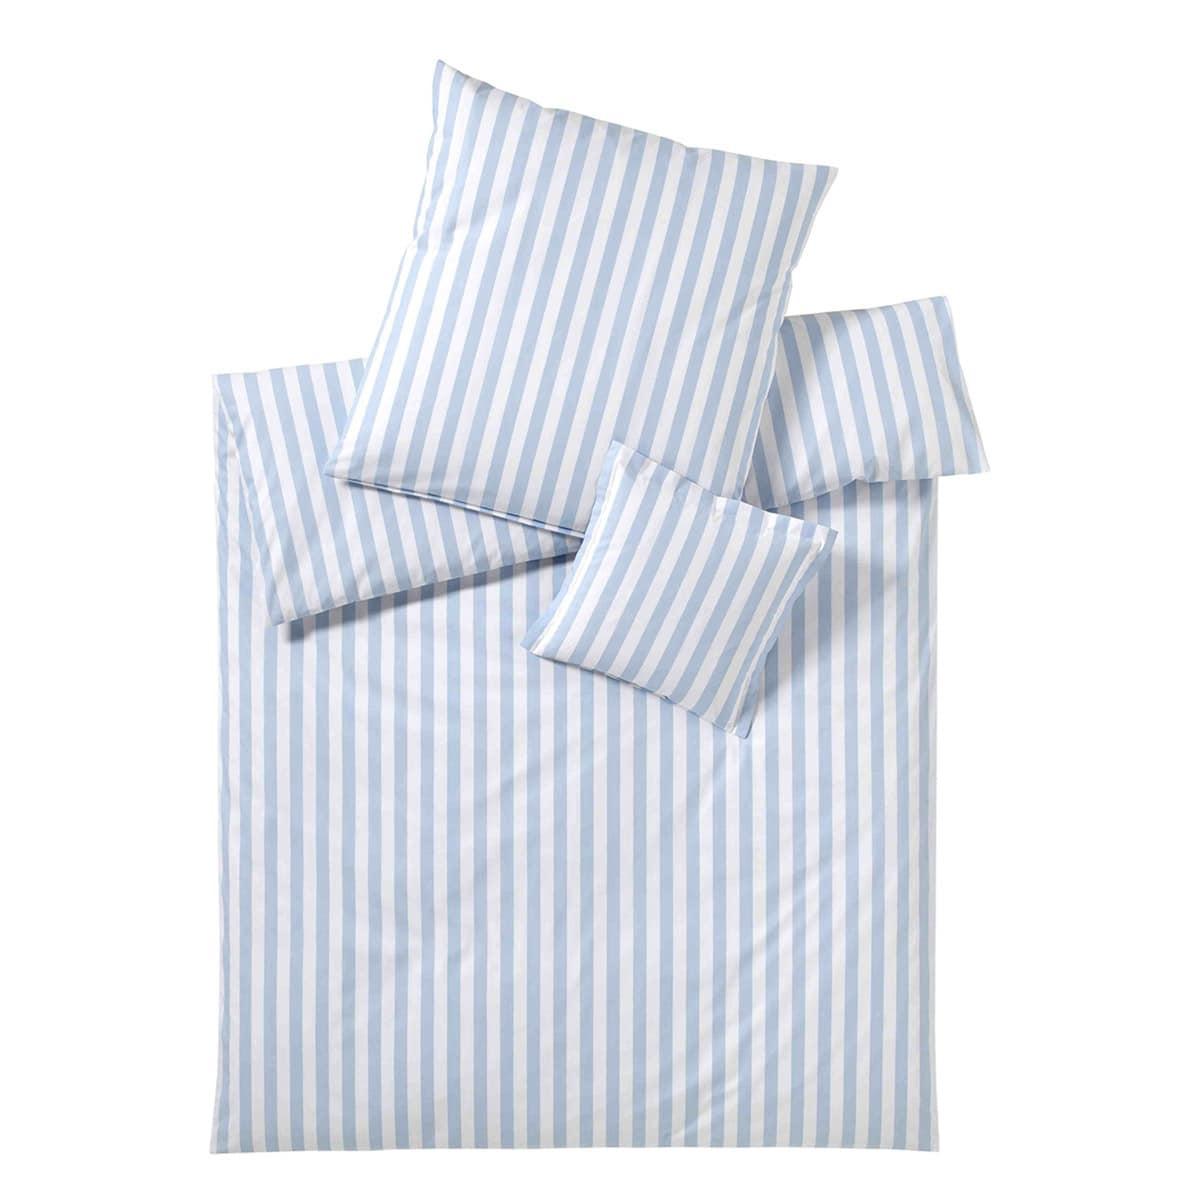 elegante bettw sche linea lido hellblau g nstig online kaufen bei bettwaren shop. Black Bedroom Furniture Sets. Home Design Ideas